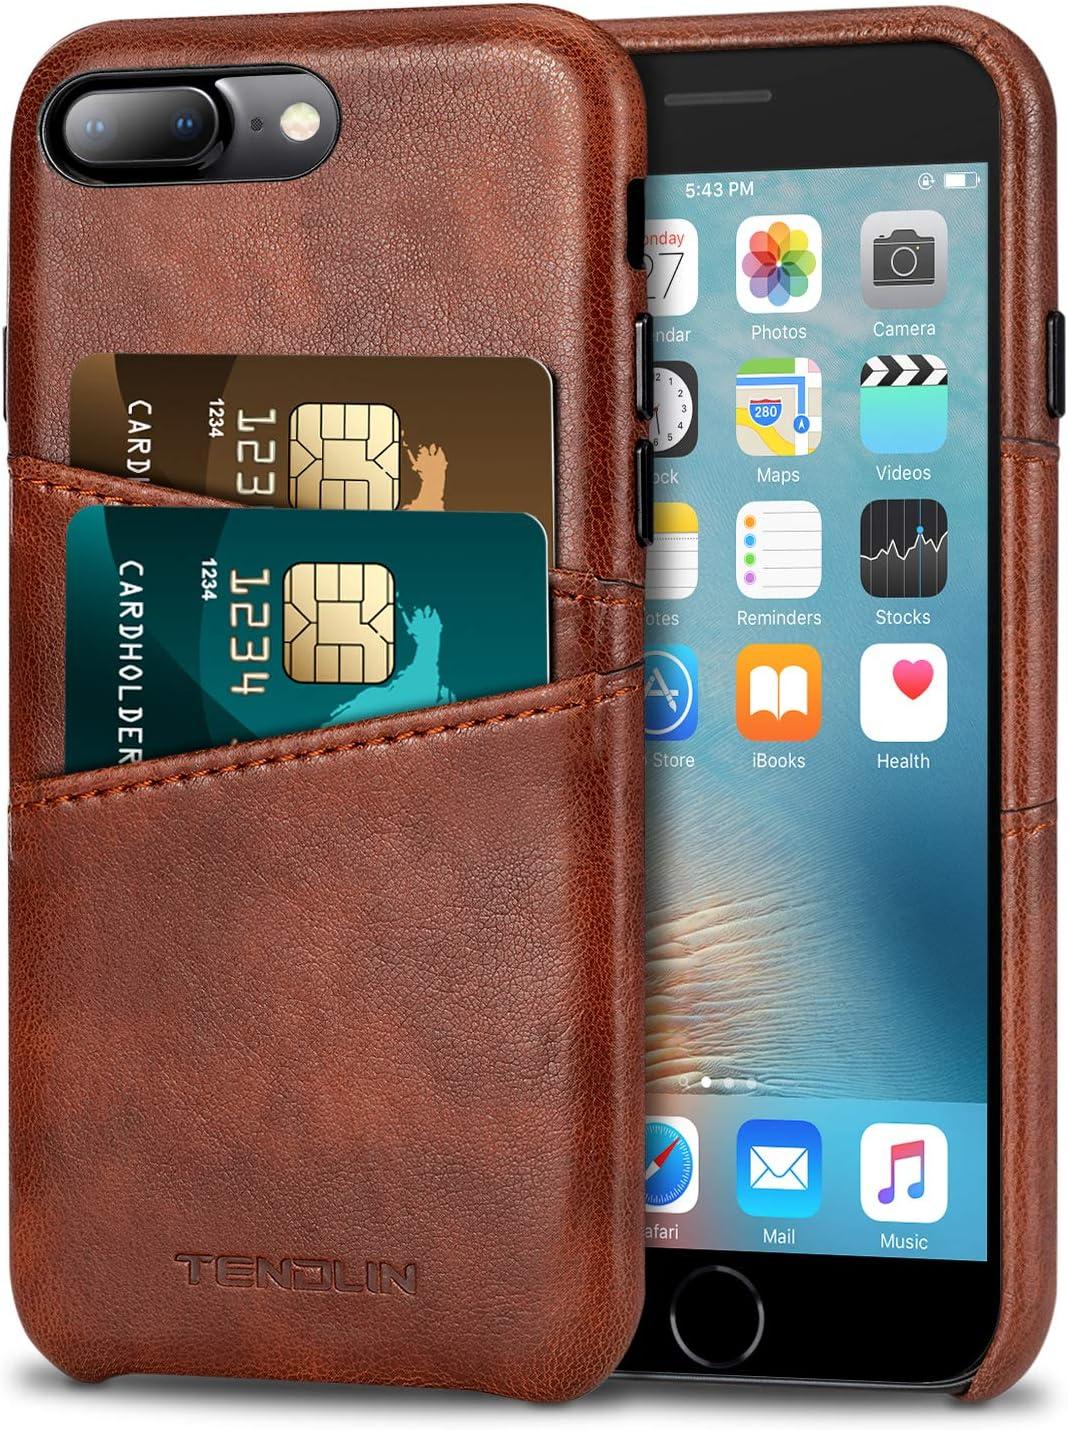 TENDLIN Compatible with iPhone 7 Plus Case/iPhone 8 Plus Case Wallet Design Premium Leather Case with 2 Card Holder Slots Compatible with iPhone 7 Plus/iPhone 8 Plus (Brown)